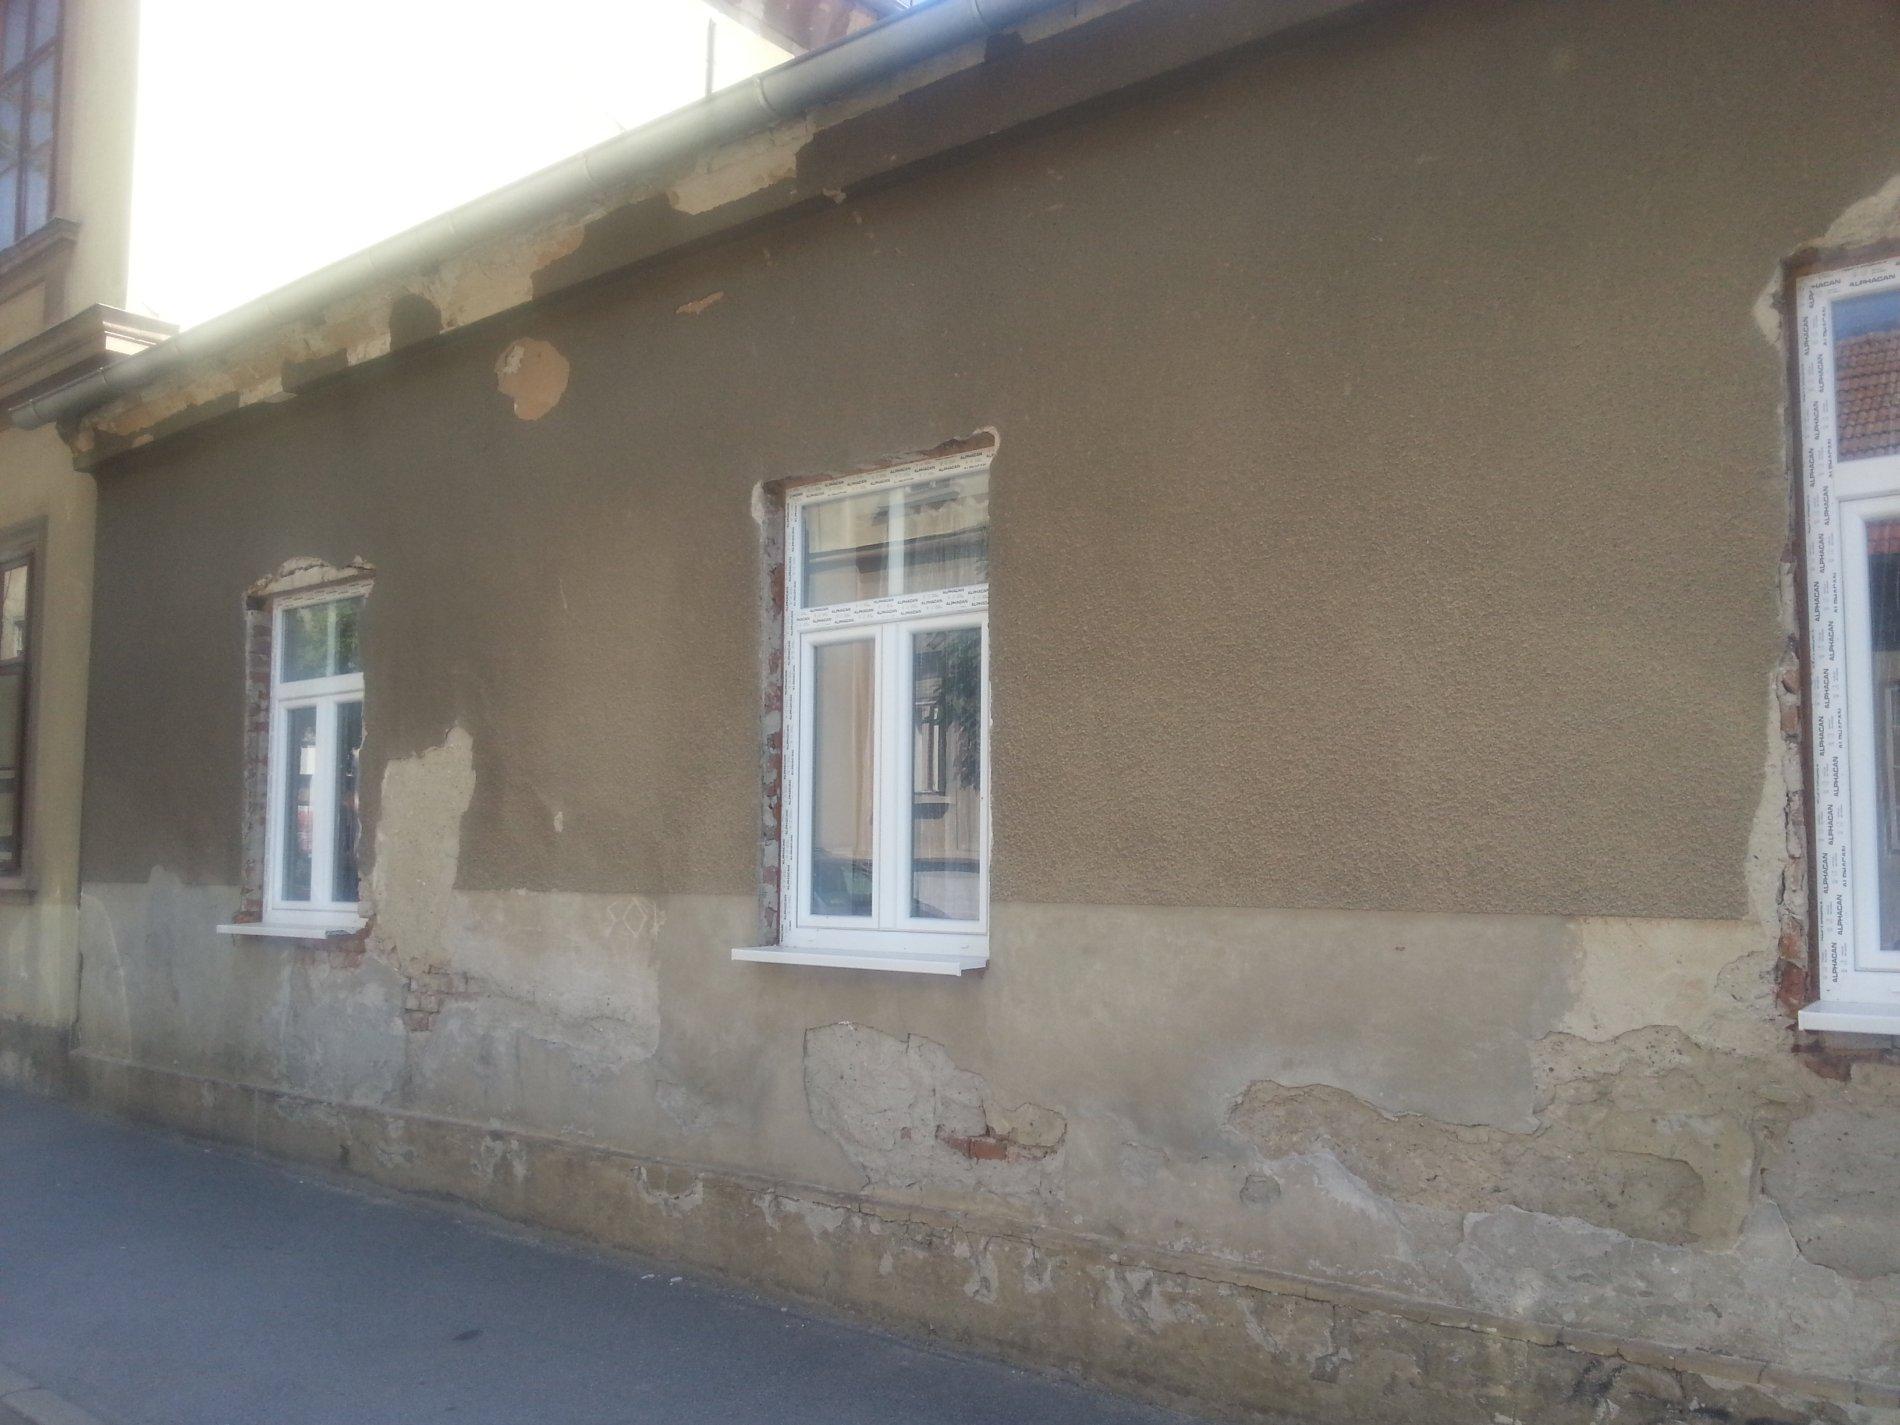 Poslovni prostori Grada Bjelovara - Ulica Dimitrija Demetra 1